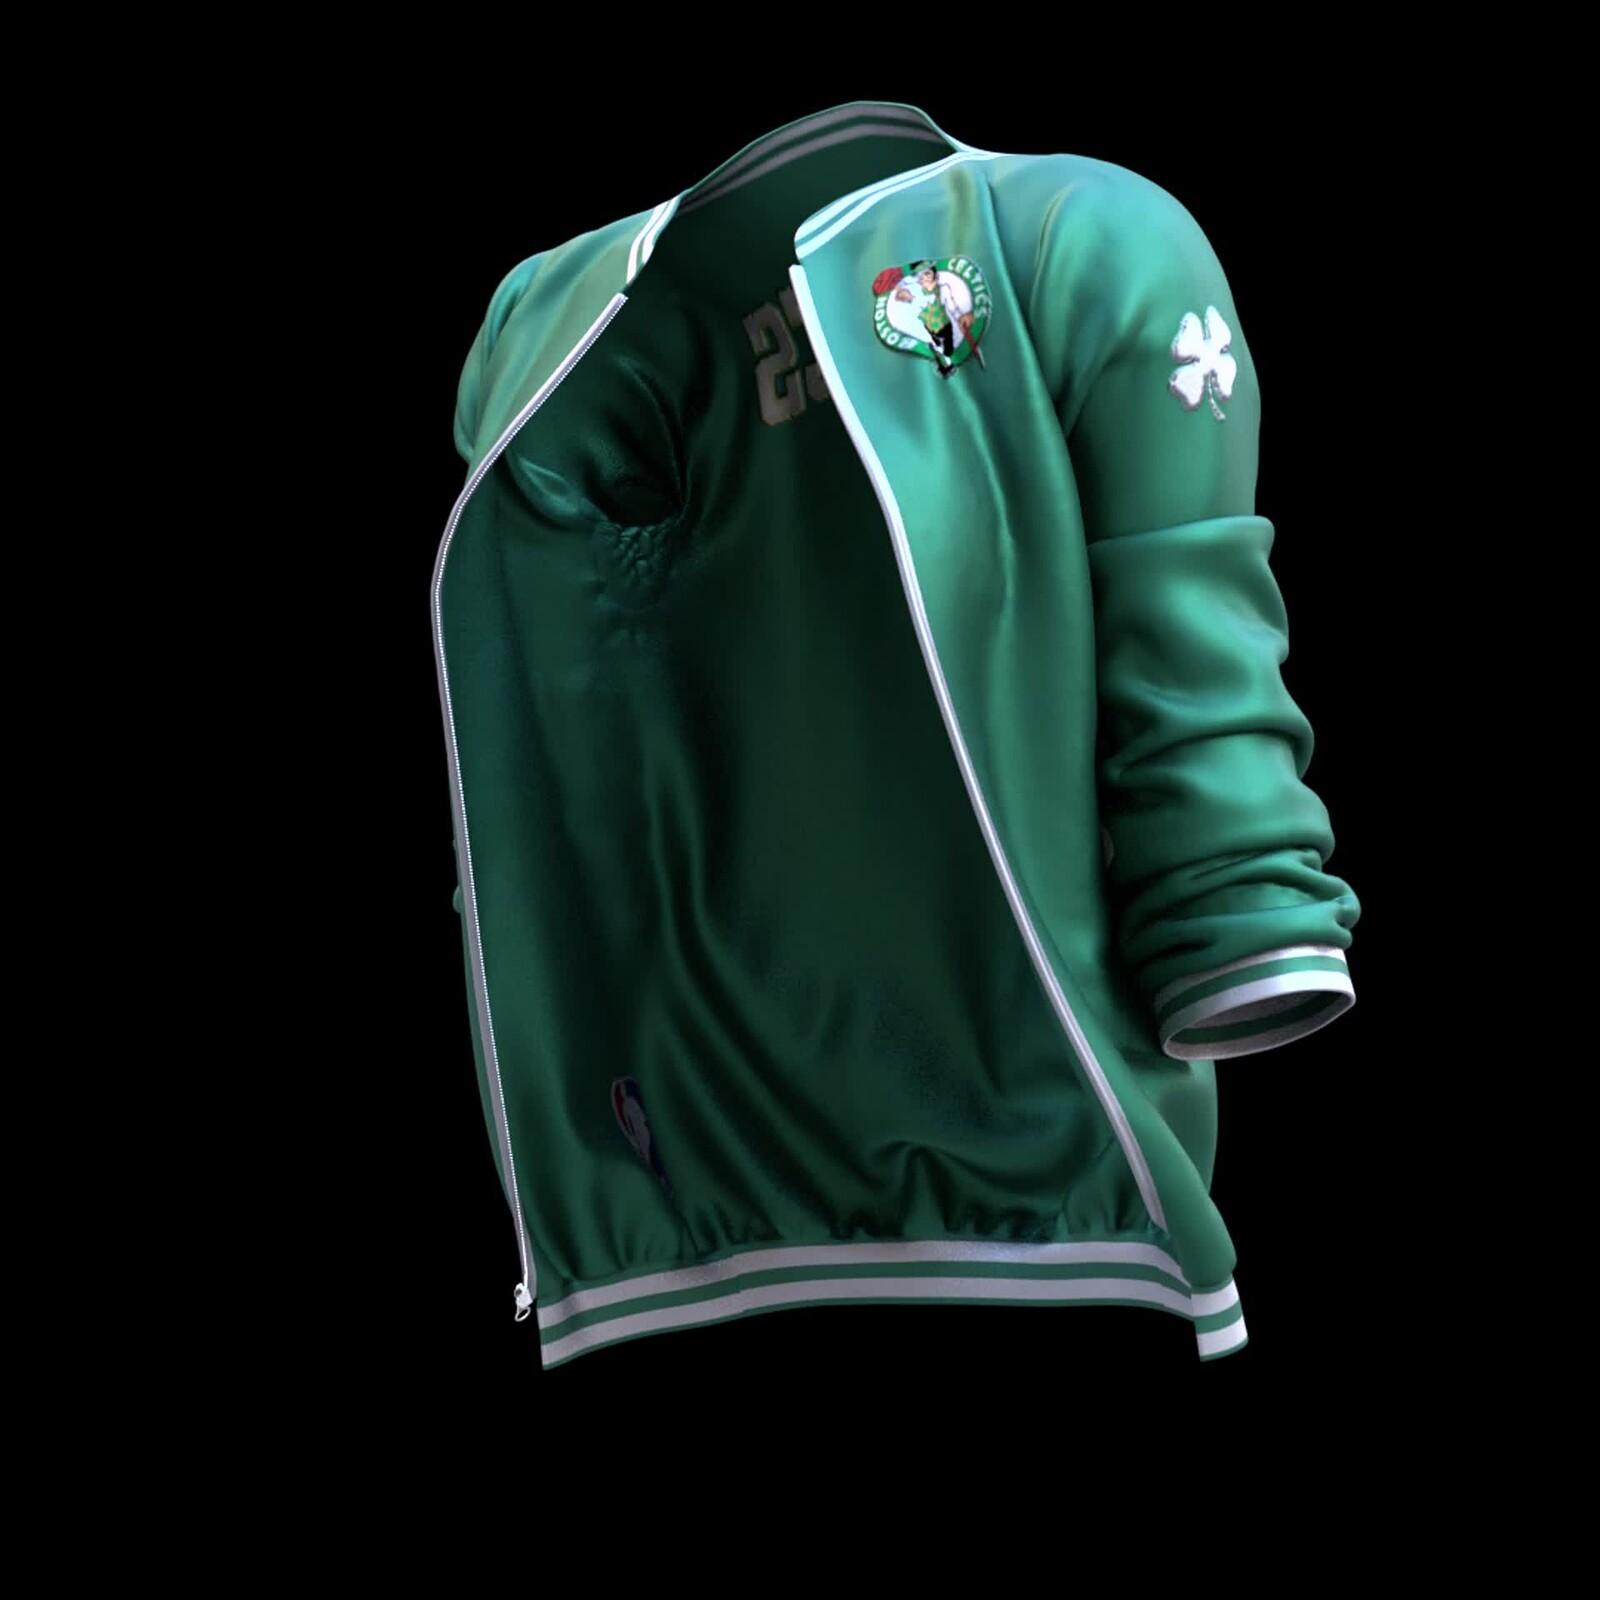 Homage to Boston Celtics! 🏀☘️